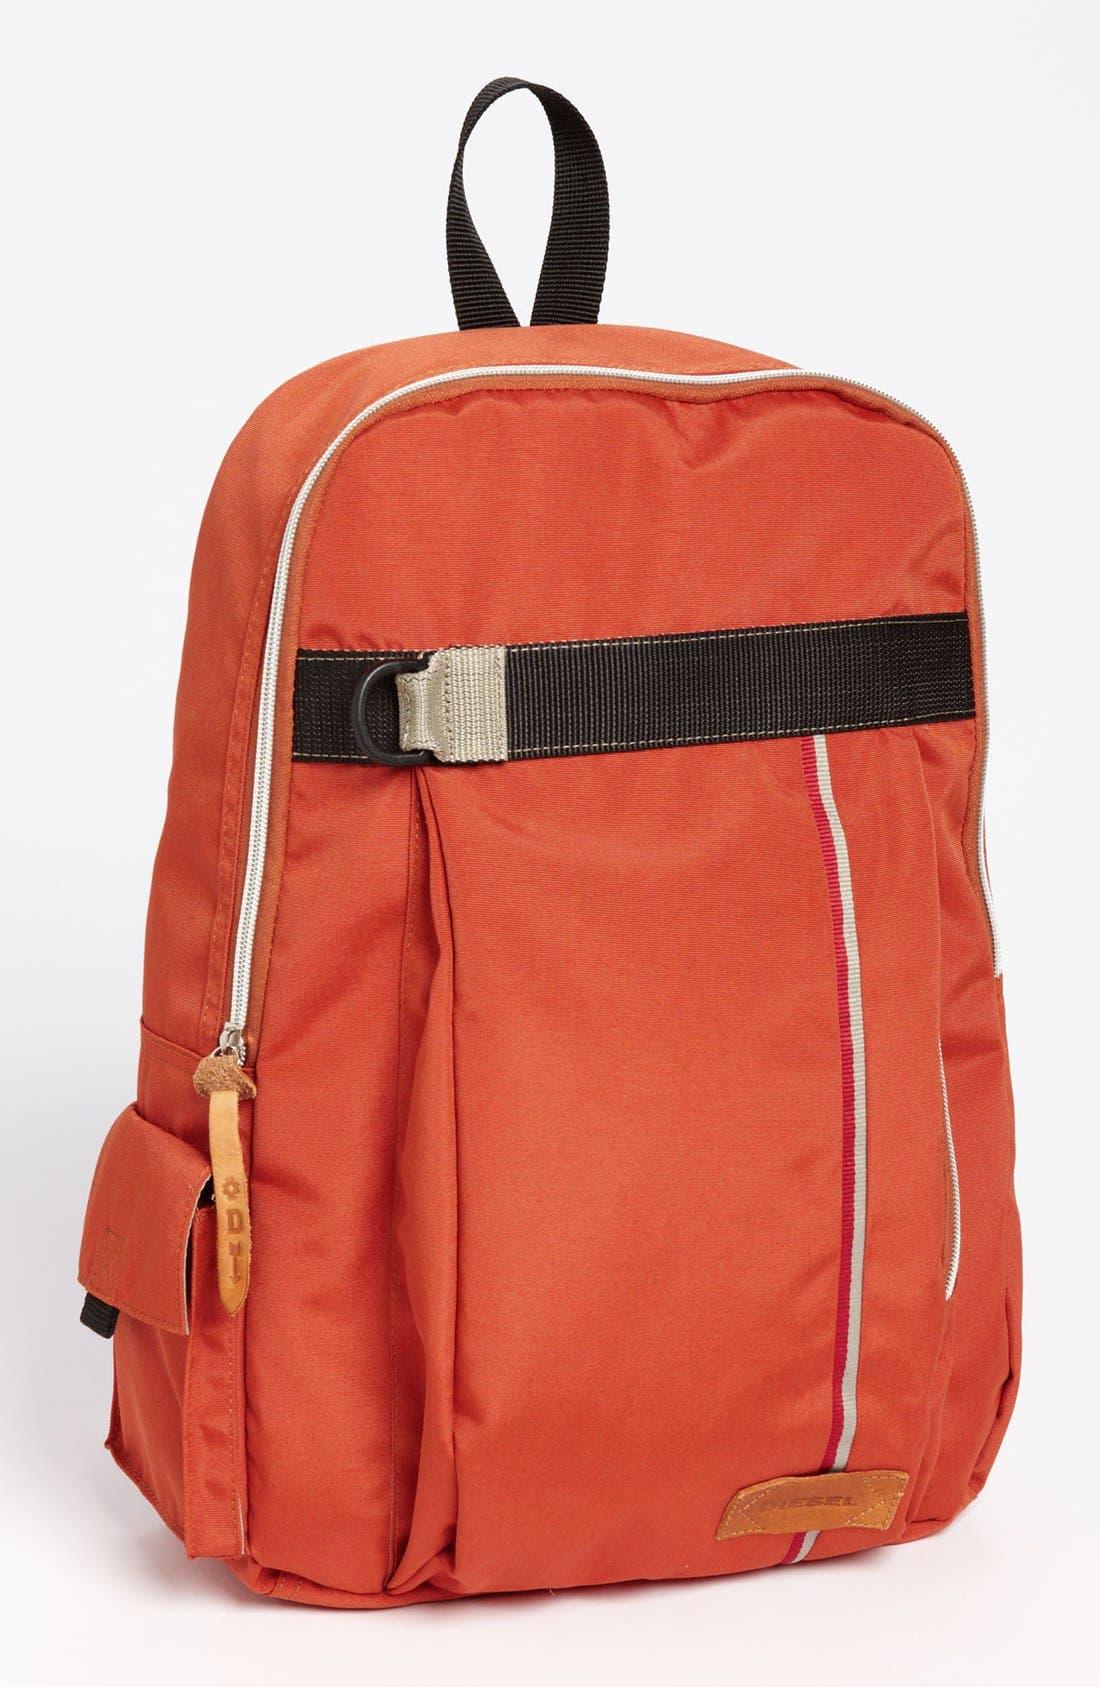 Alternate Image 1 Selected - DIESEL® 'Get on Track' Backpack